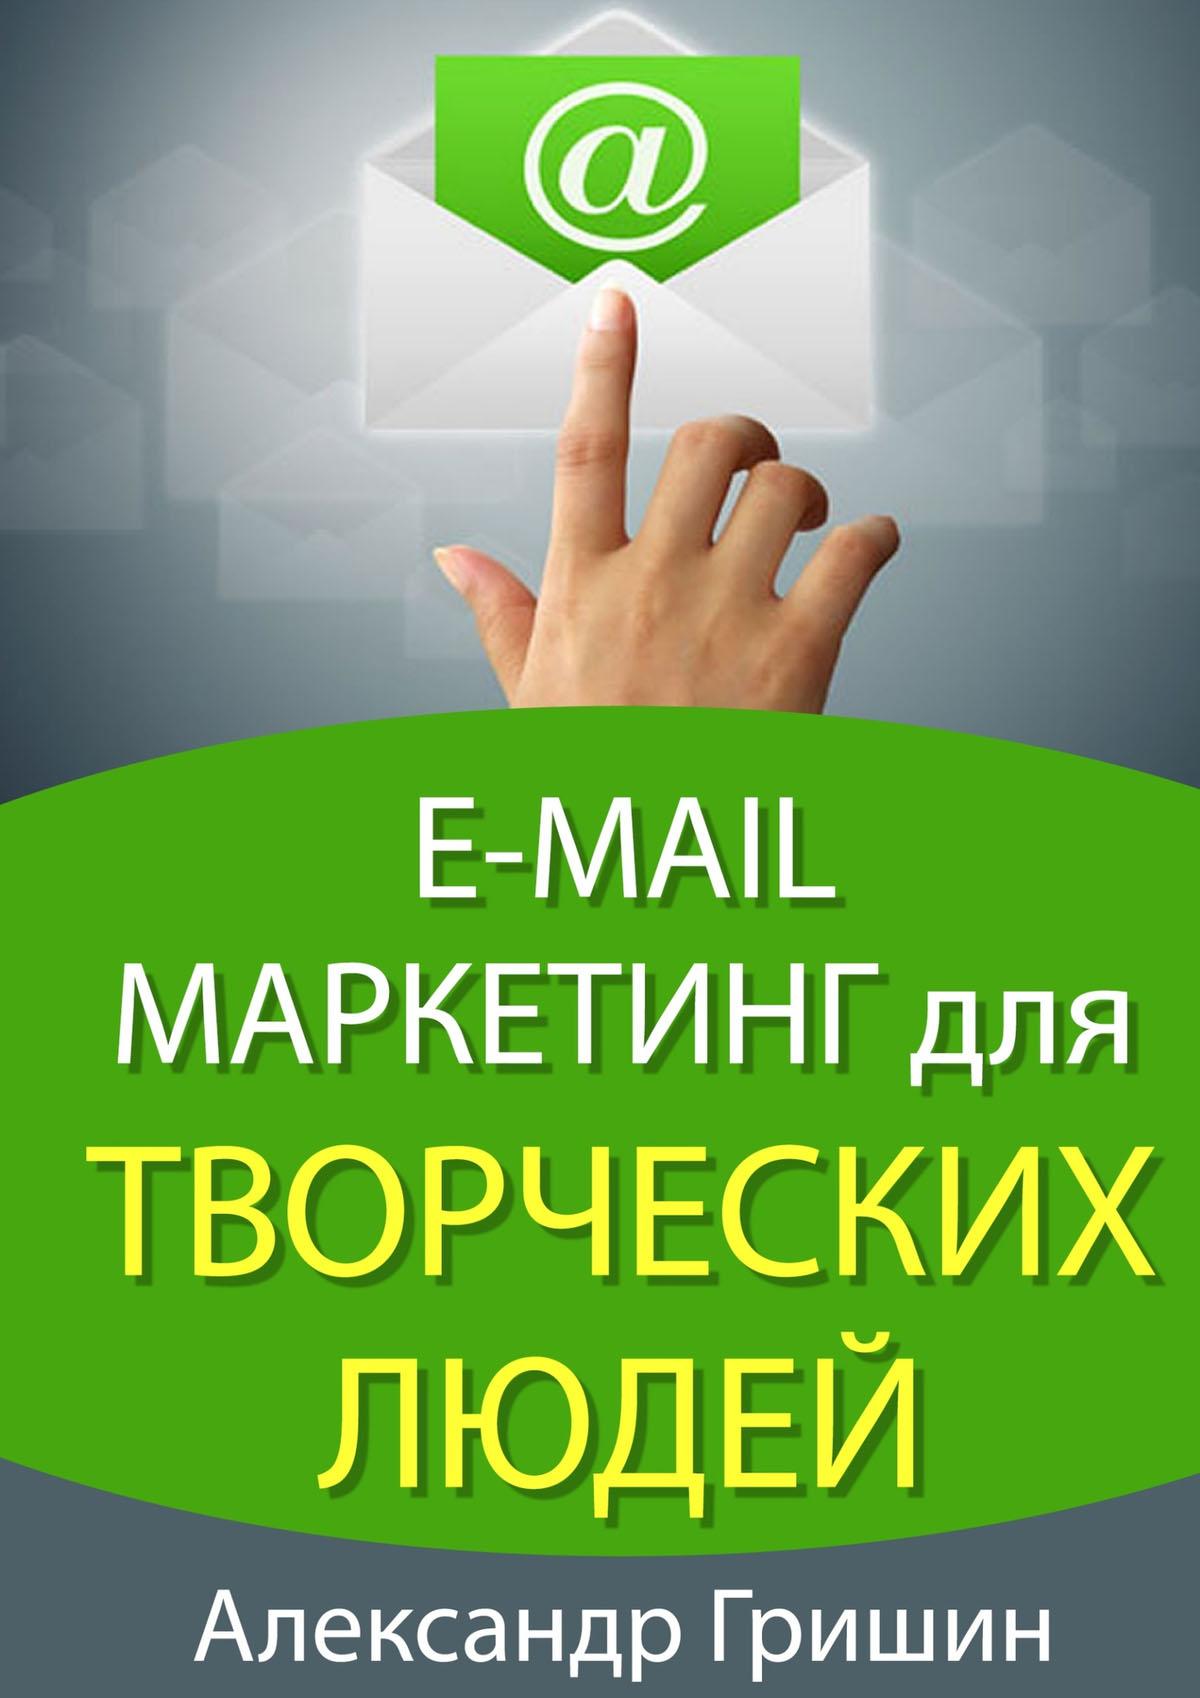 Александр Гришин E-mail маркетинг длятворческих людей